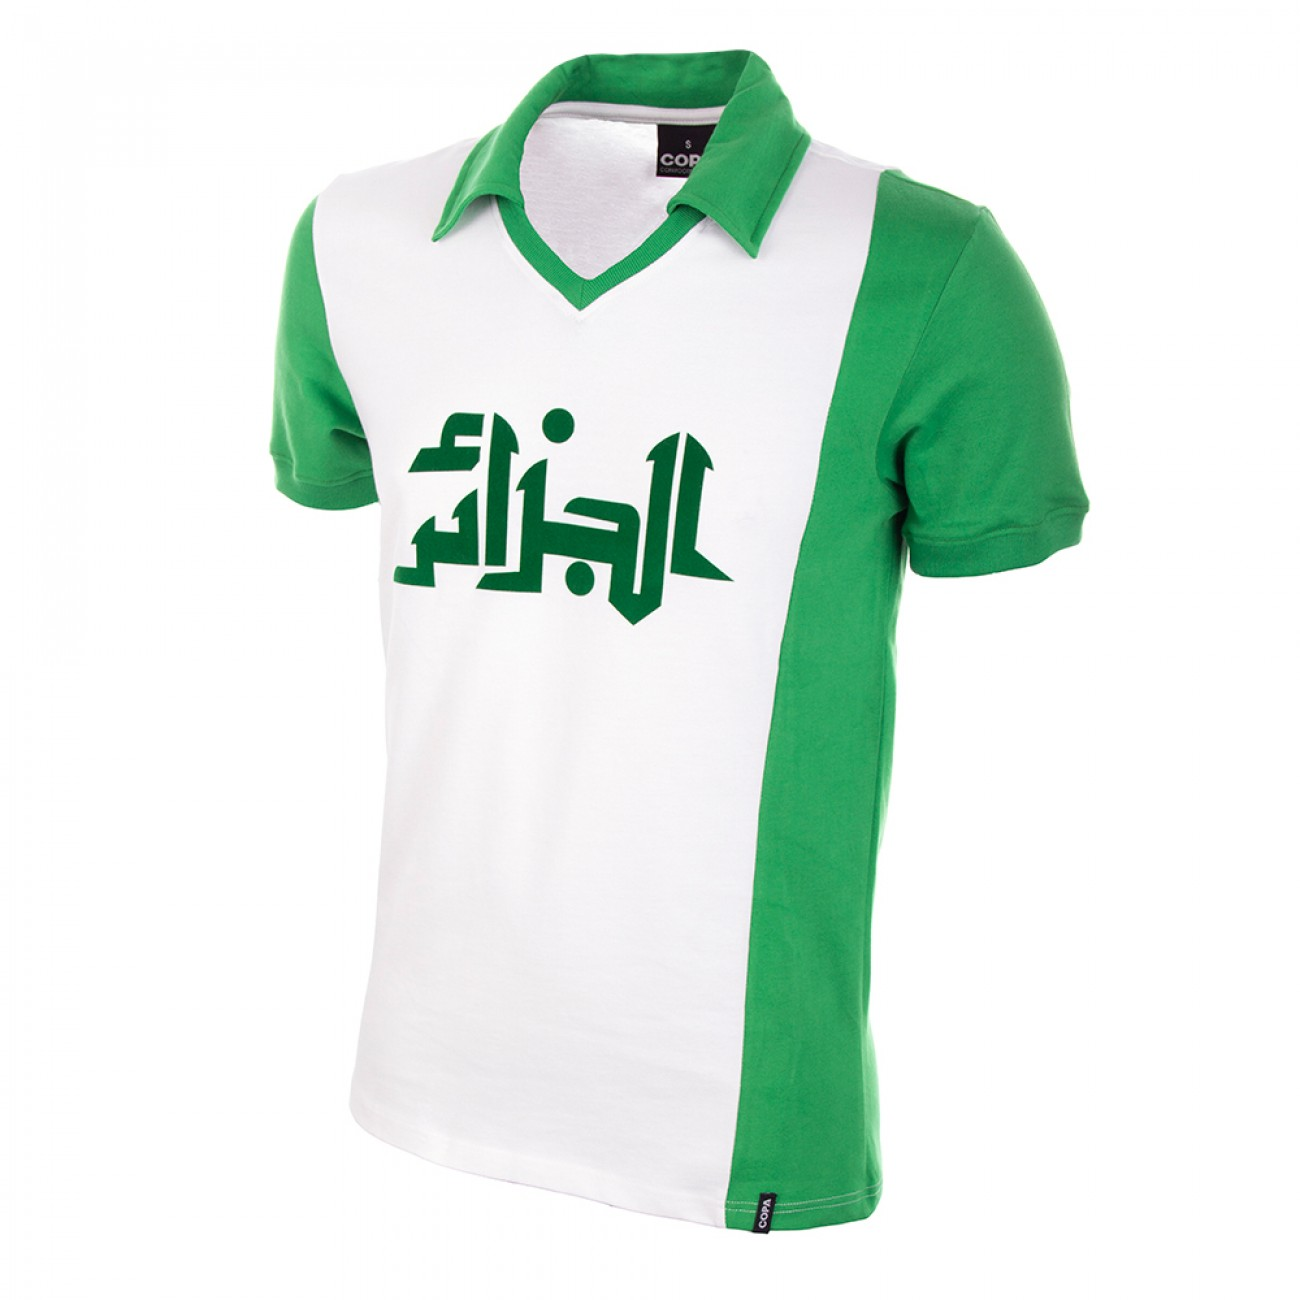 http://www.retrofootball.es/ropa-de-futbol/camiseta-argelia-mundial-1982.html